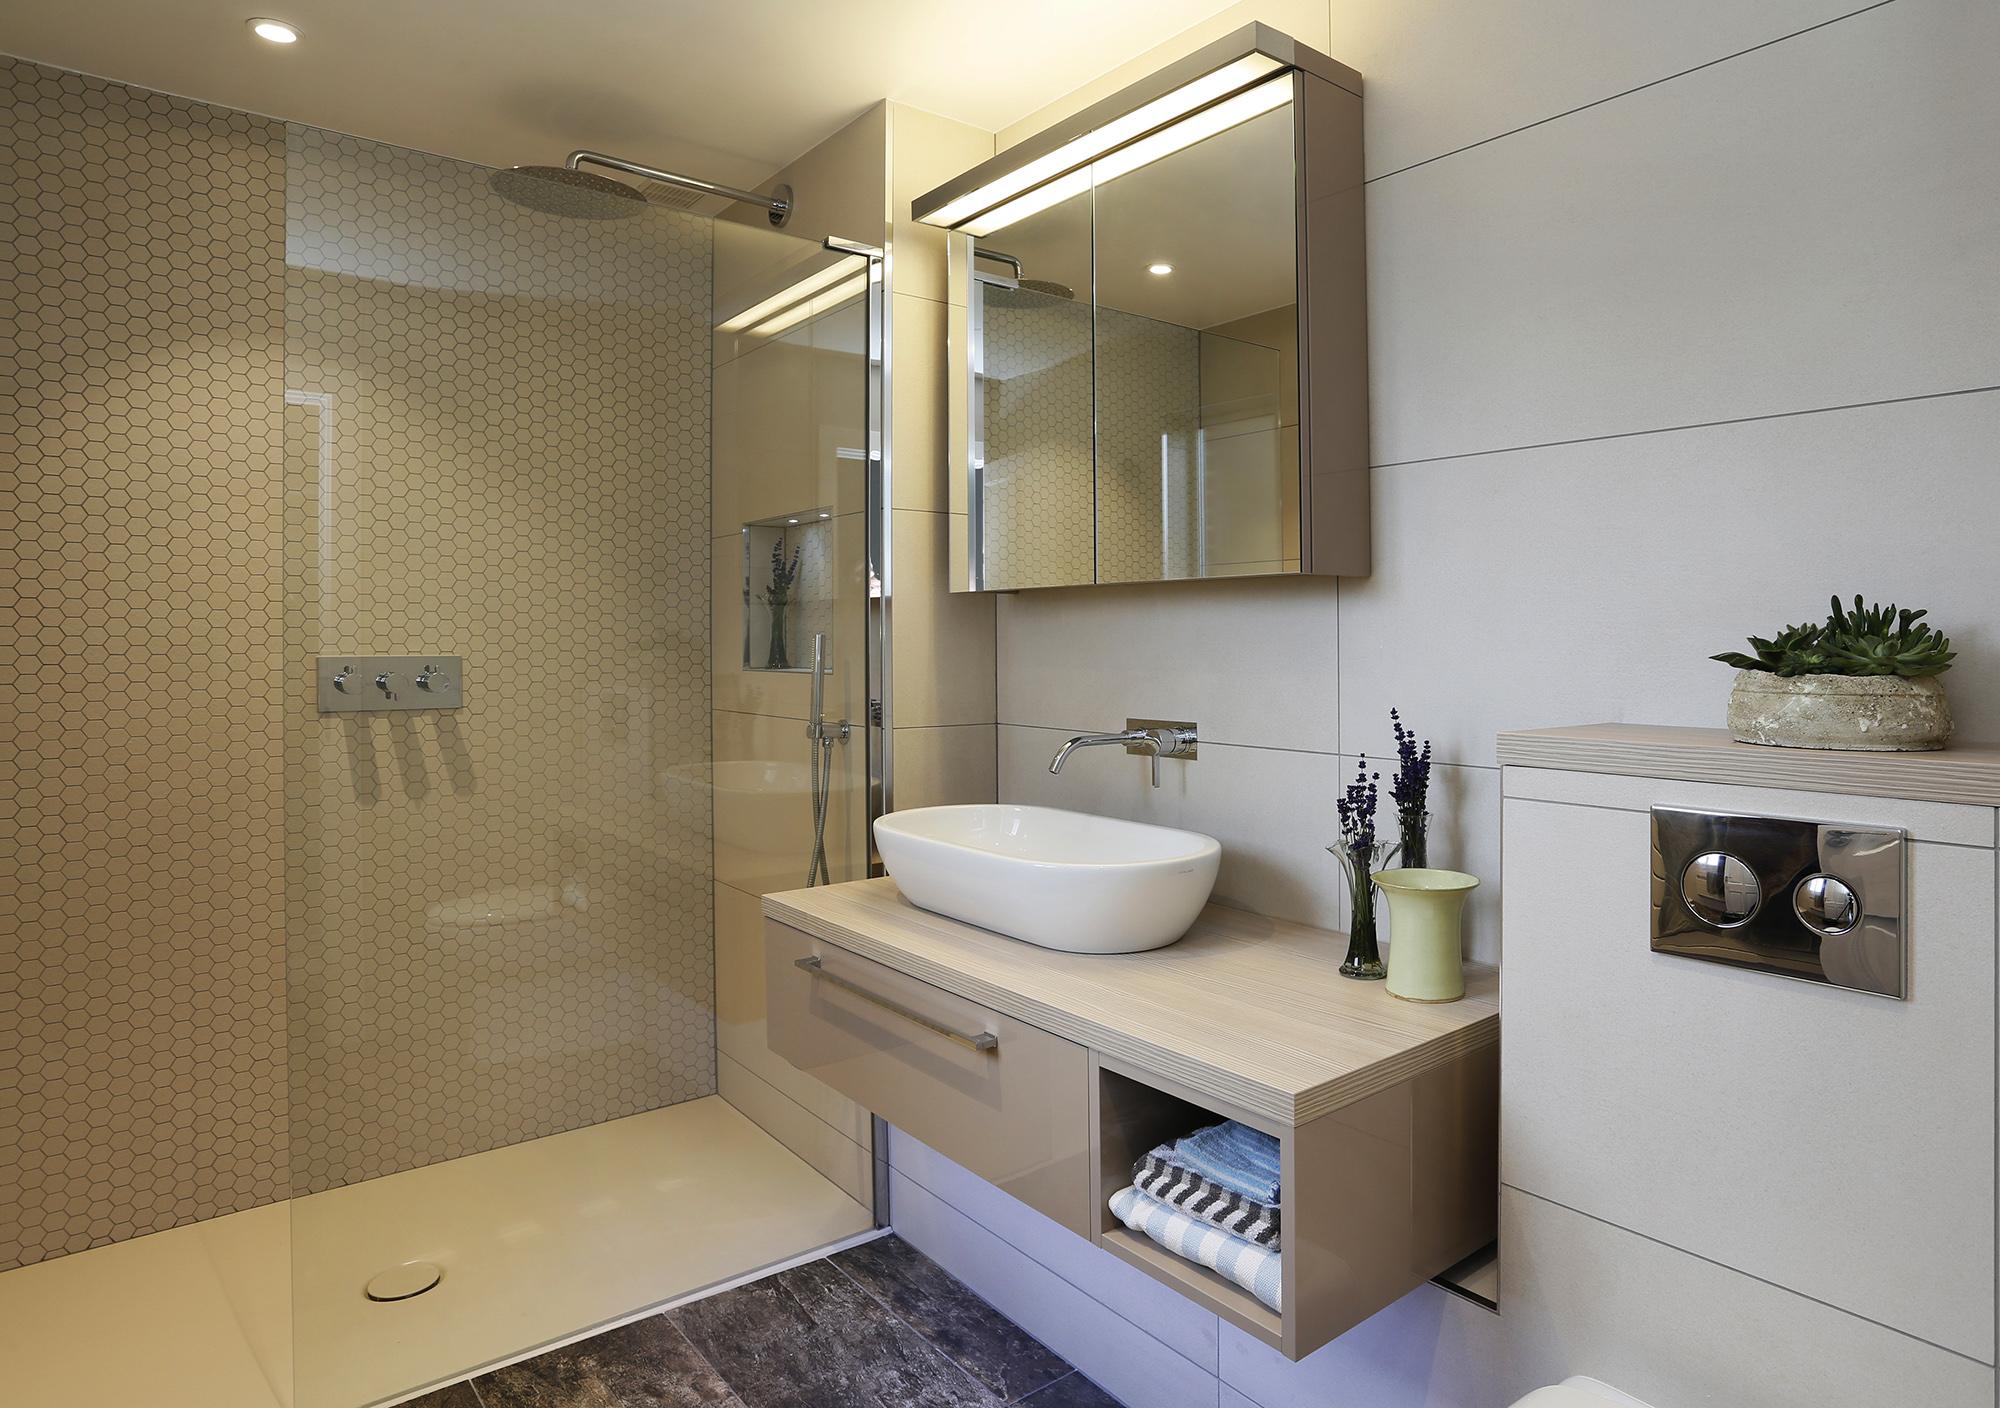 Contemporary family house interior design images